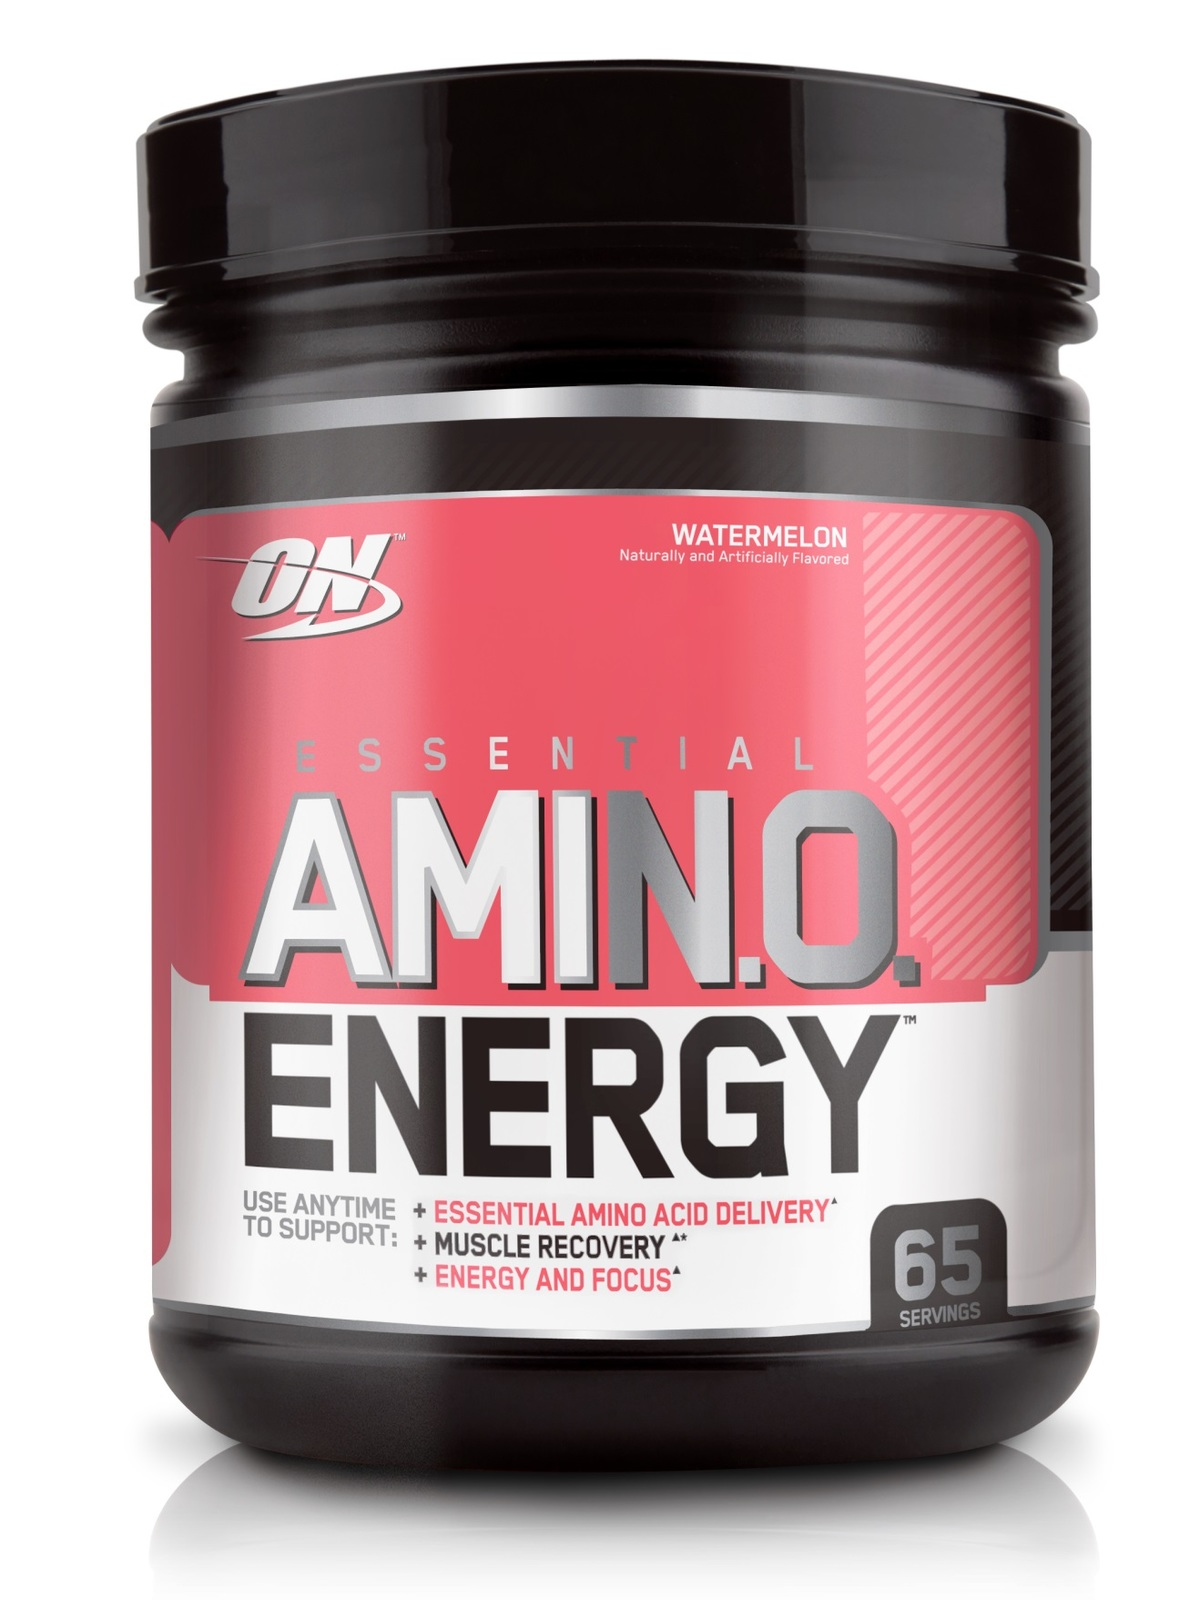 Optimum Nutrition Amino Energy Drink - Watermelon (65 Serves) image